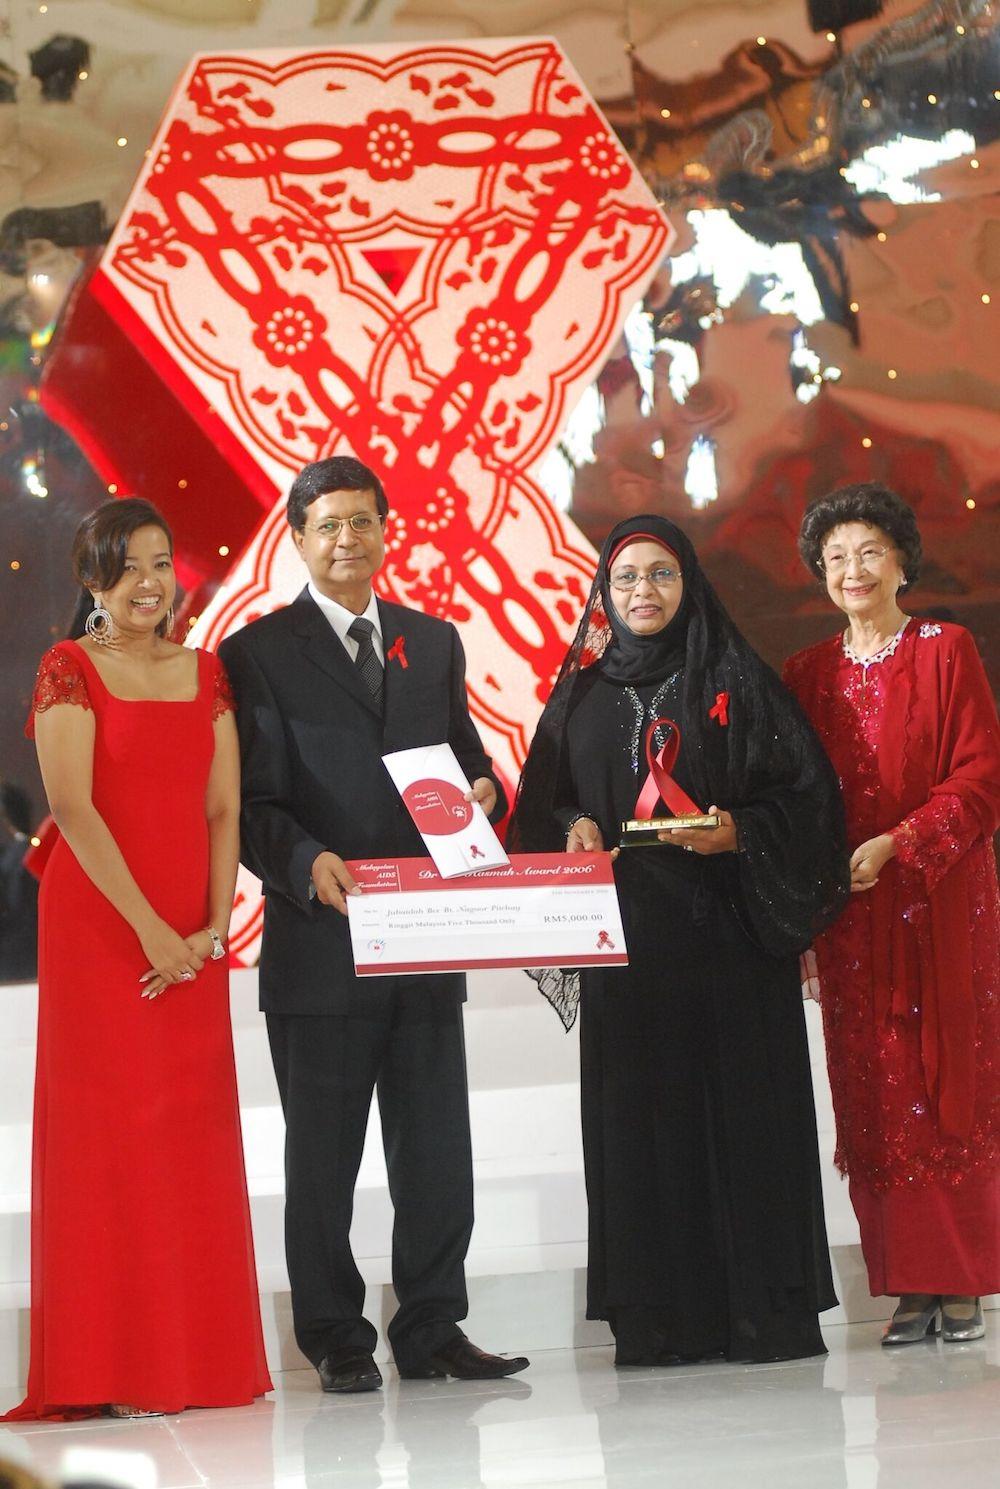 (From left) Former MAF chairman Datin Paduka Marina Mahathir, then Chopard Geneva executive director Rolf Knuschel, Jubaidah and Dr Siti Hasmah at the 2006 award presentation dinner. — Picture courtesy of MAF